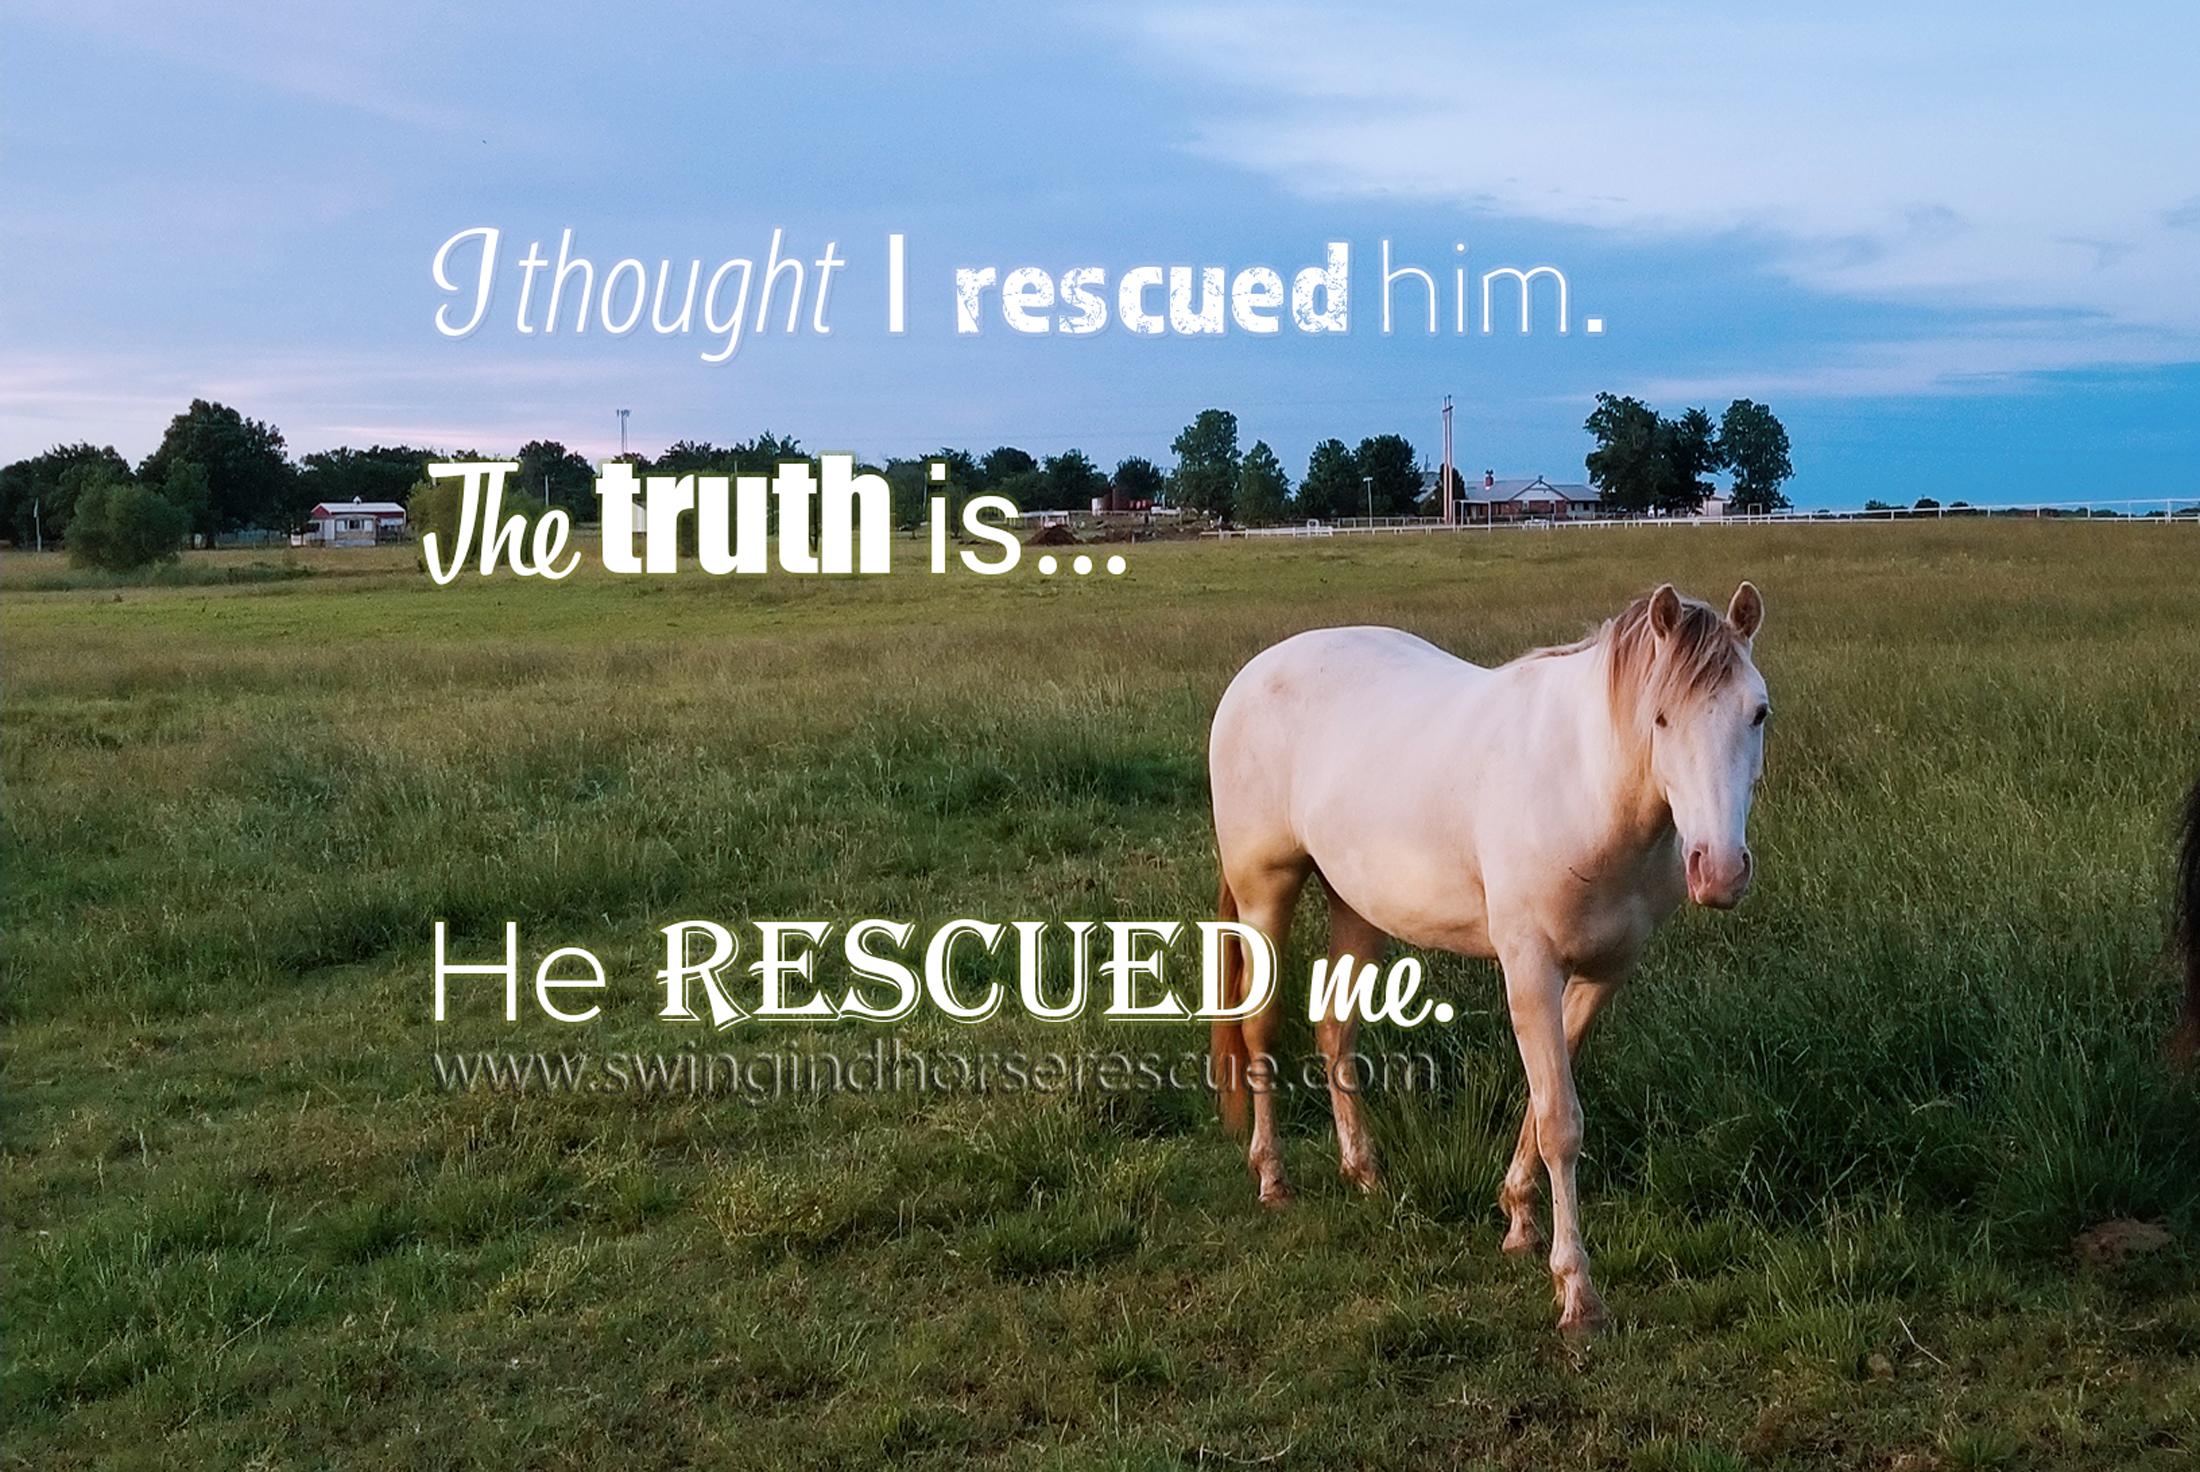 Winston at Swingin' D Horse Rescue